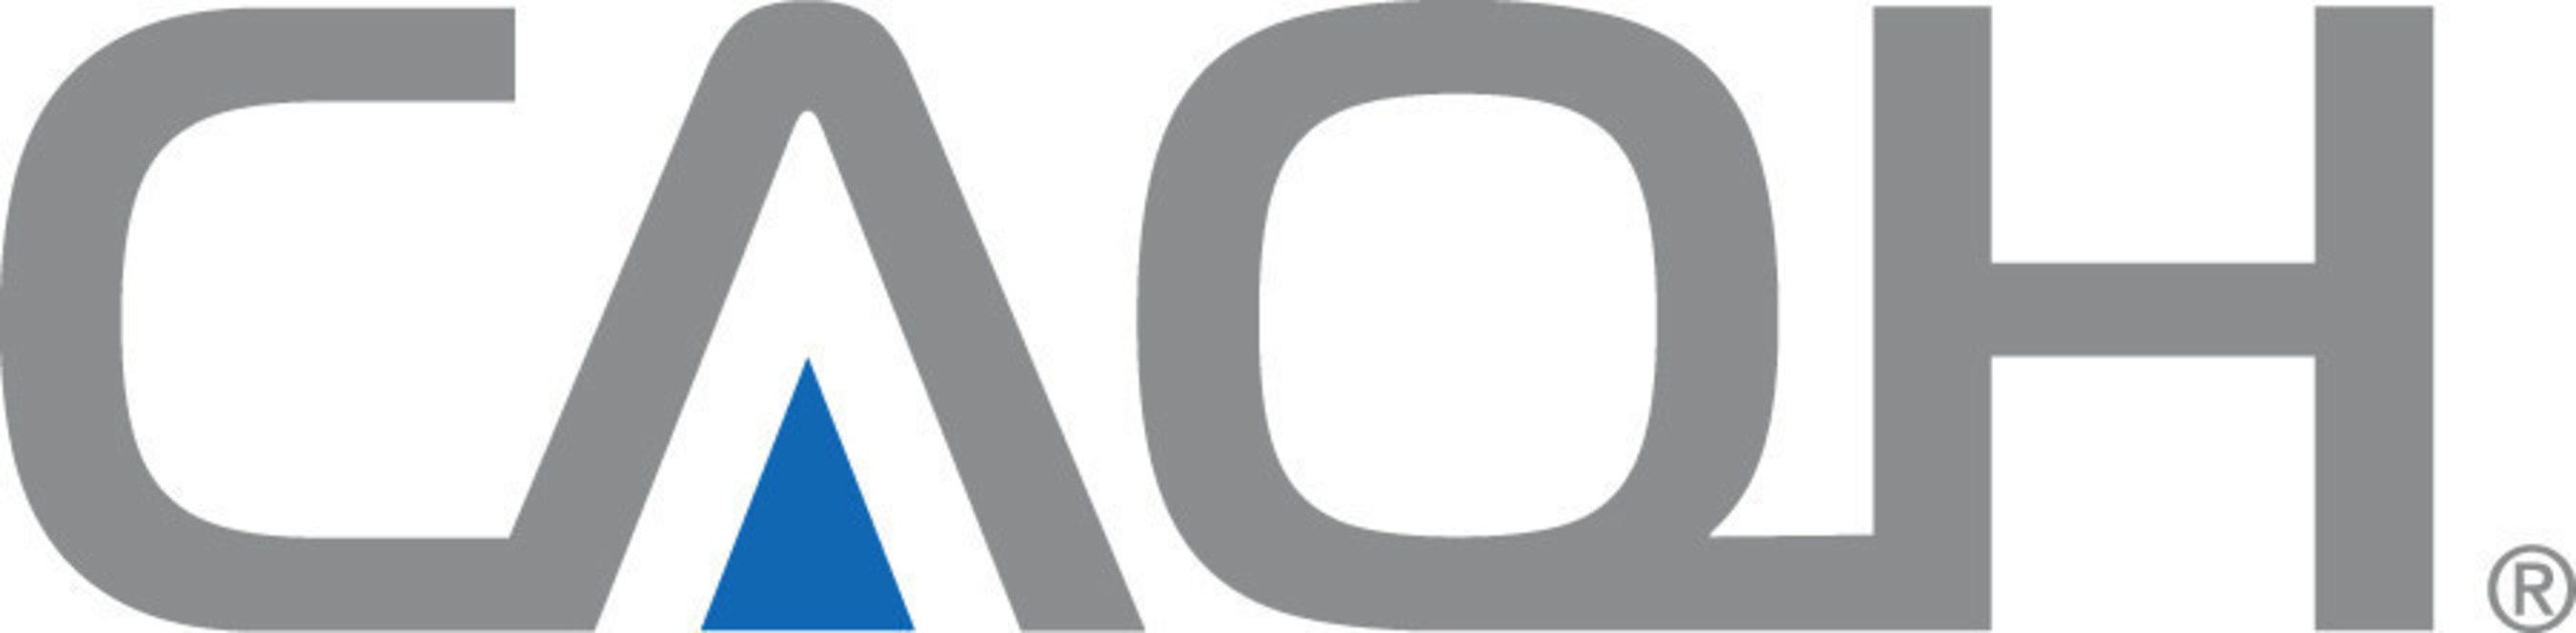 CAQH Logo